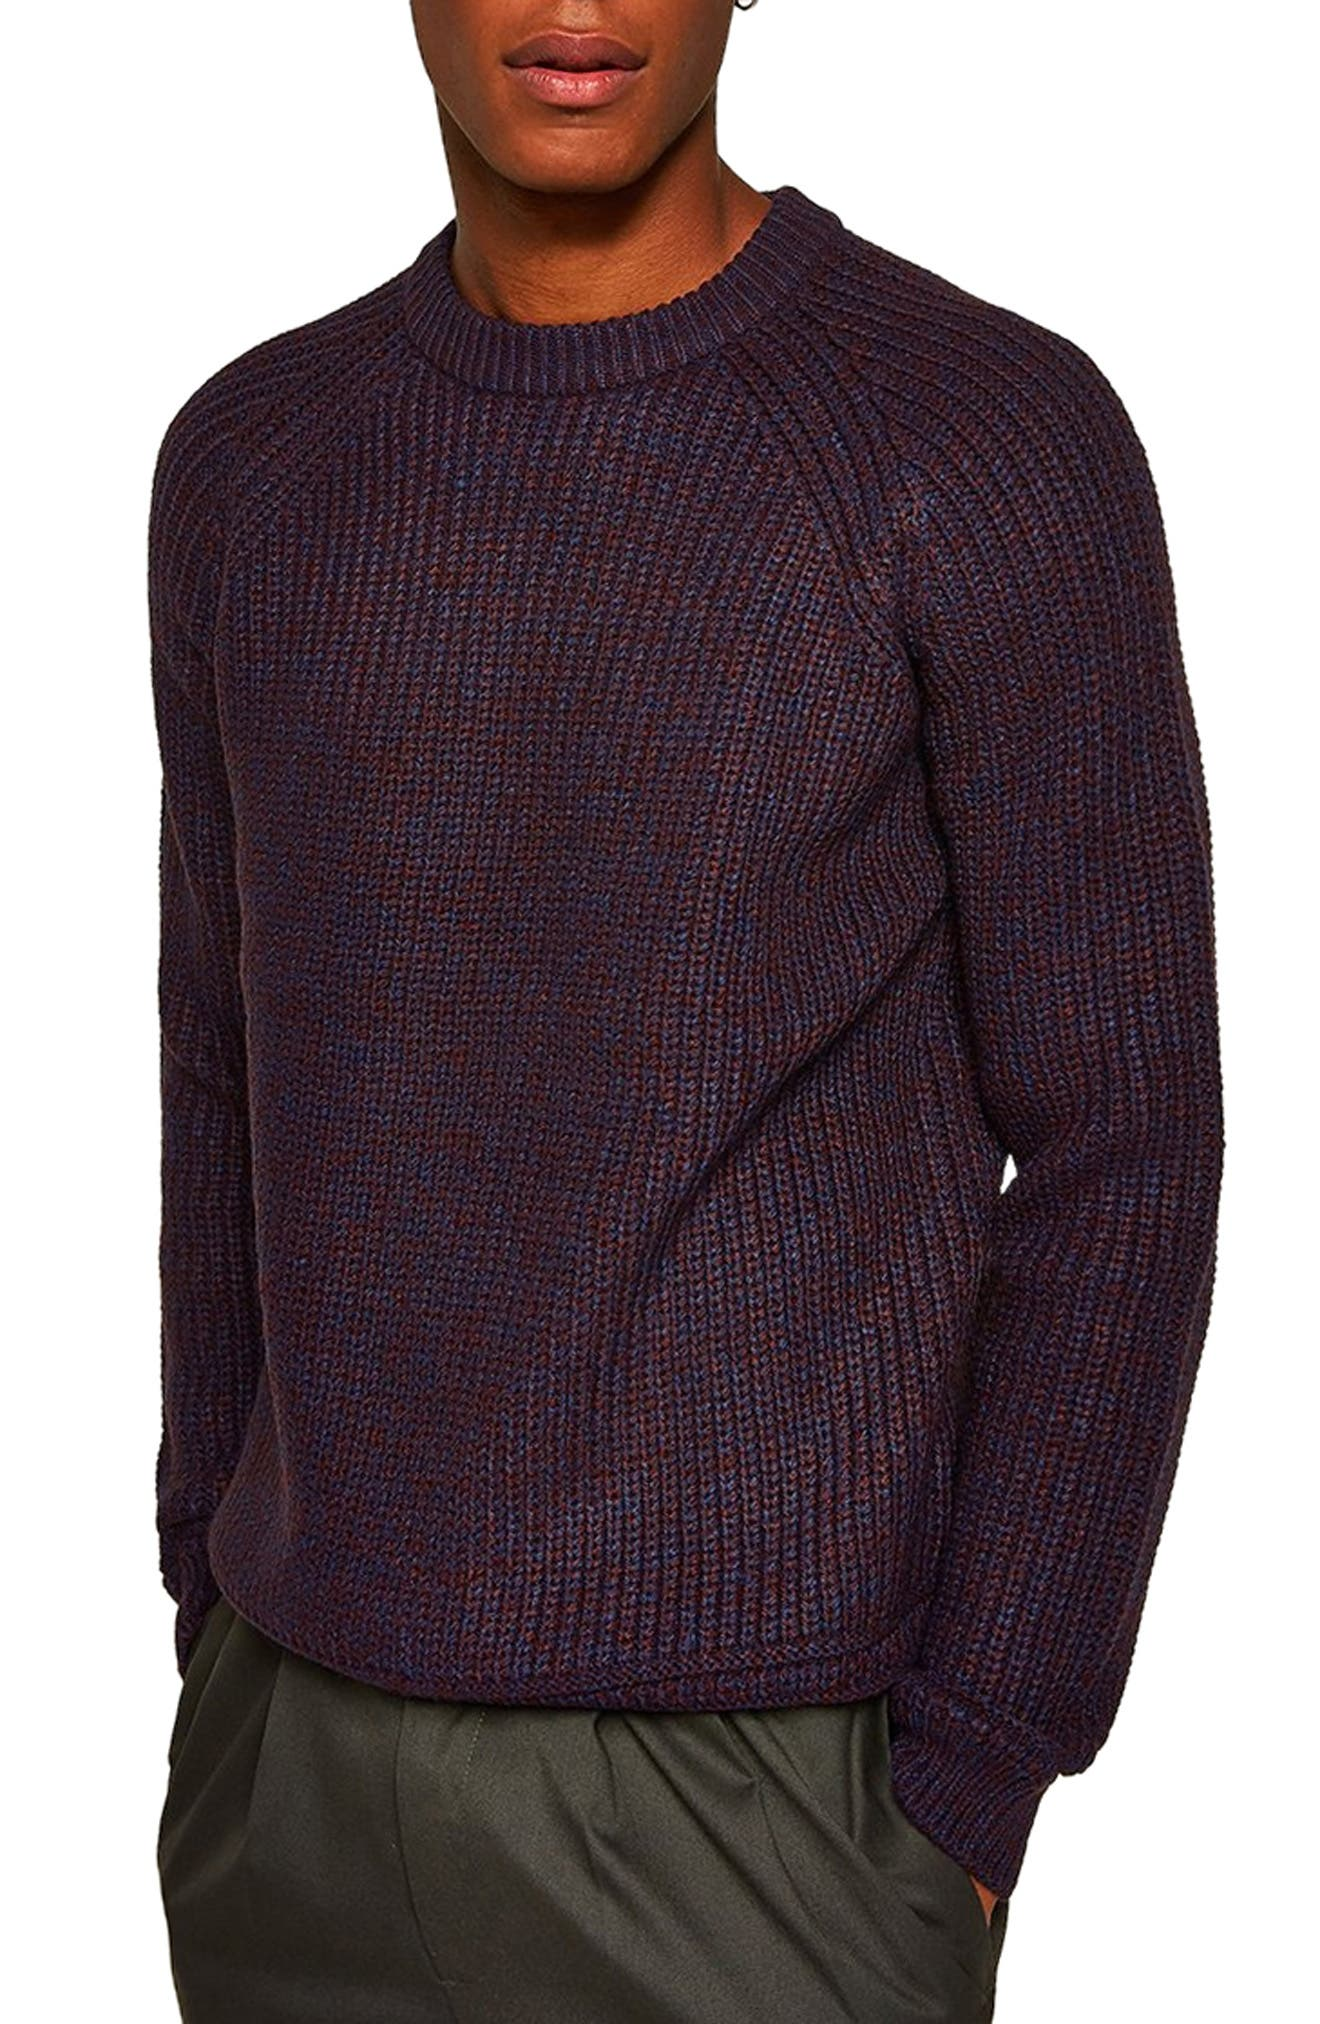 Crewneck Sweater,                             Main thumbnail 1, color,                             BURGUNDY MULTI